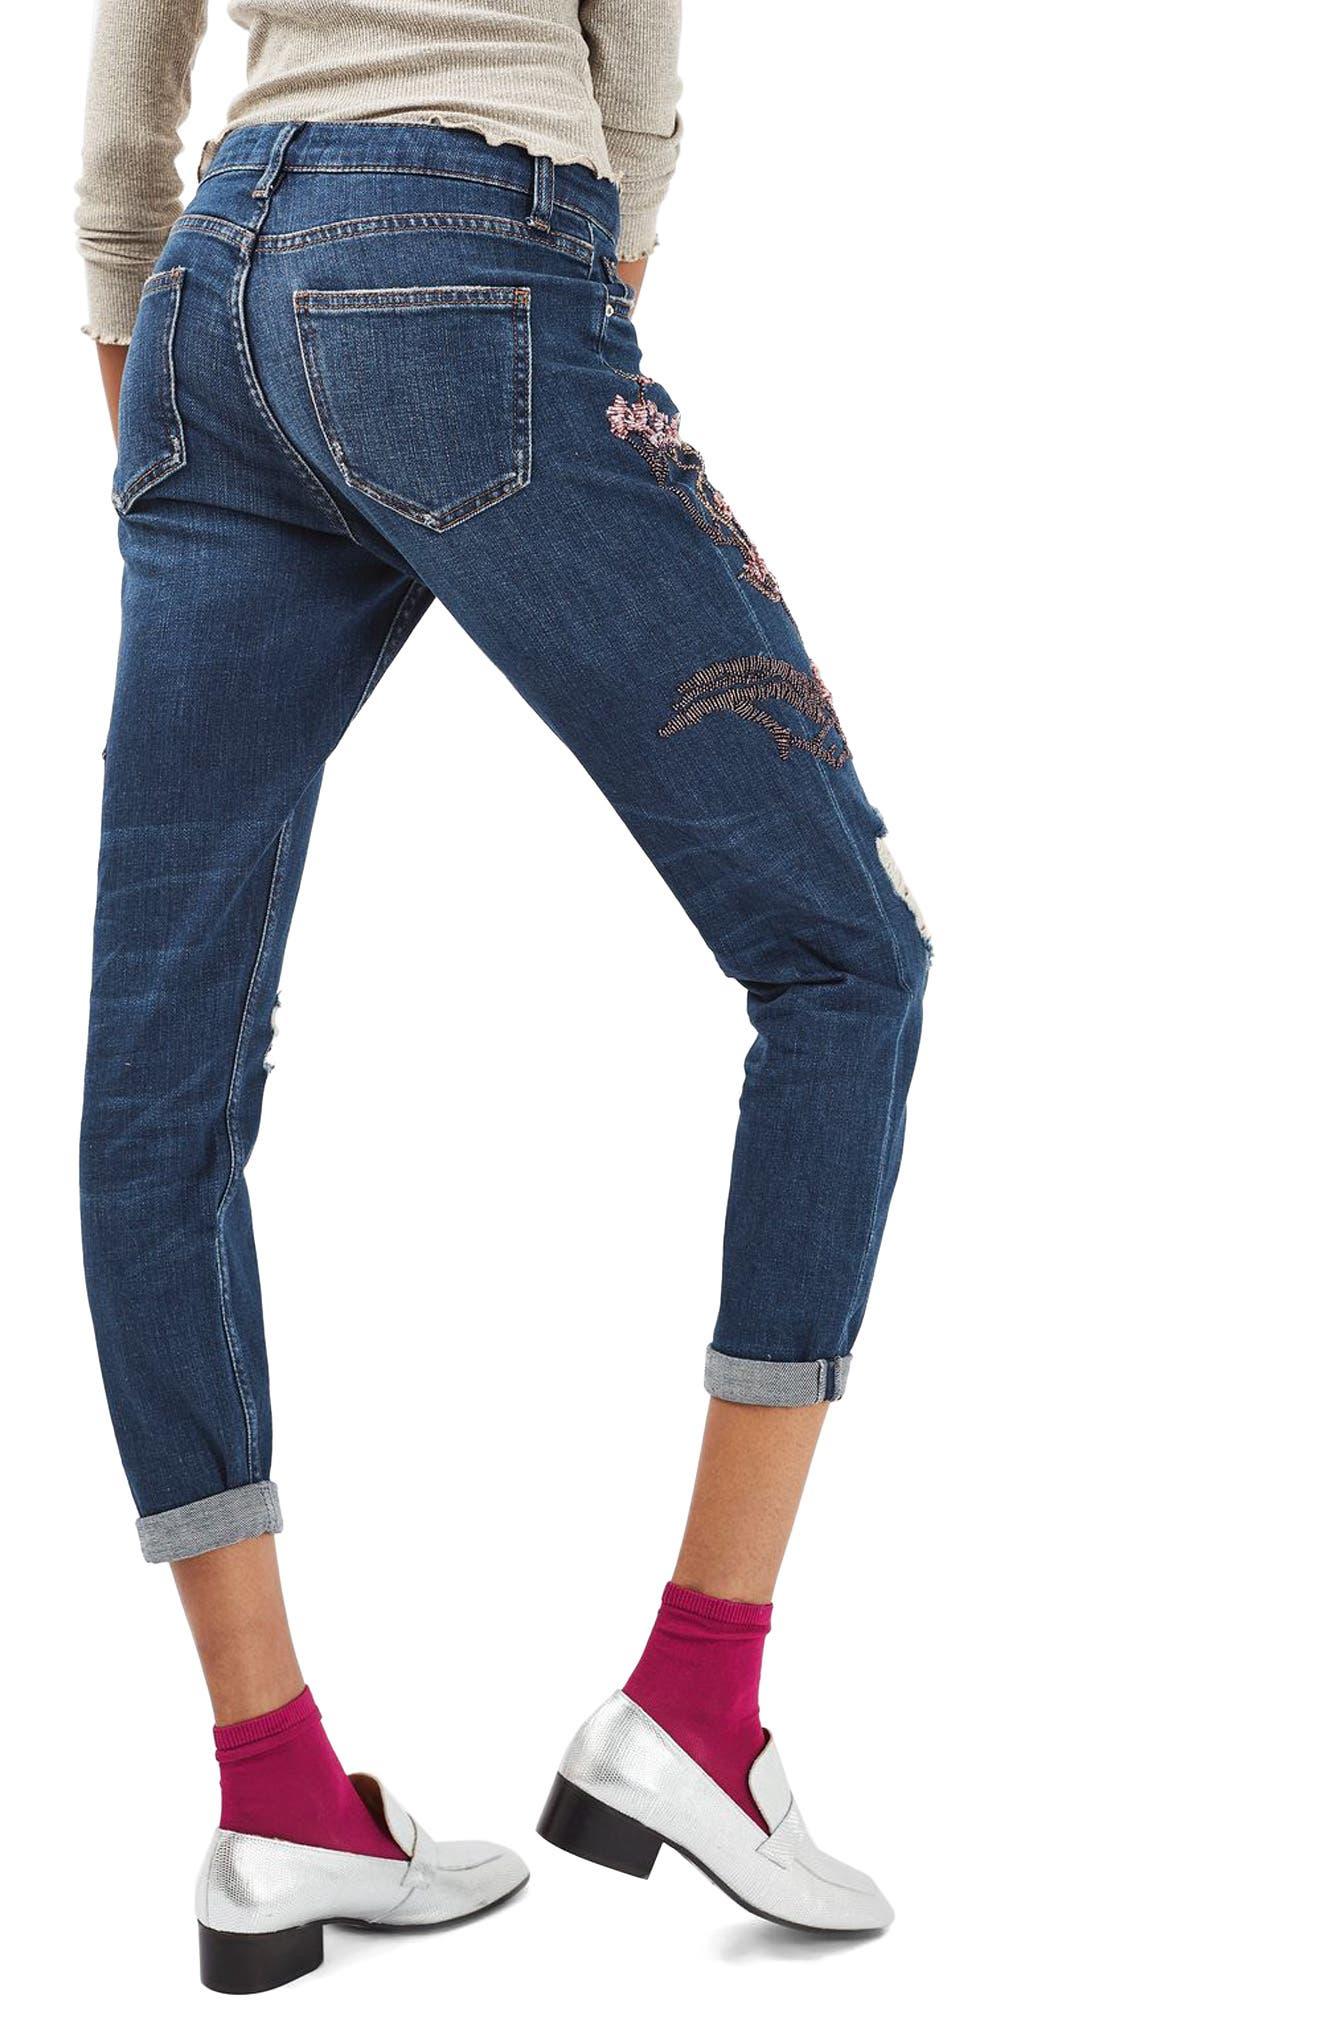 Alternate Image 3  - Topshop Lucas Beaded Boyfriend Jeans (Limited Edition)